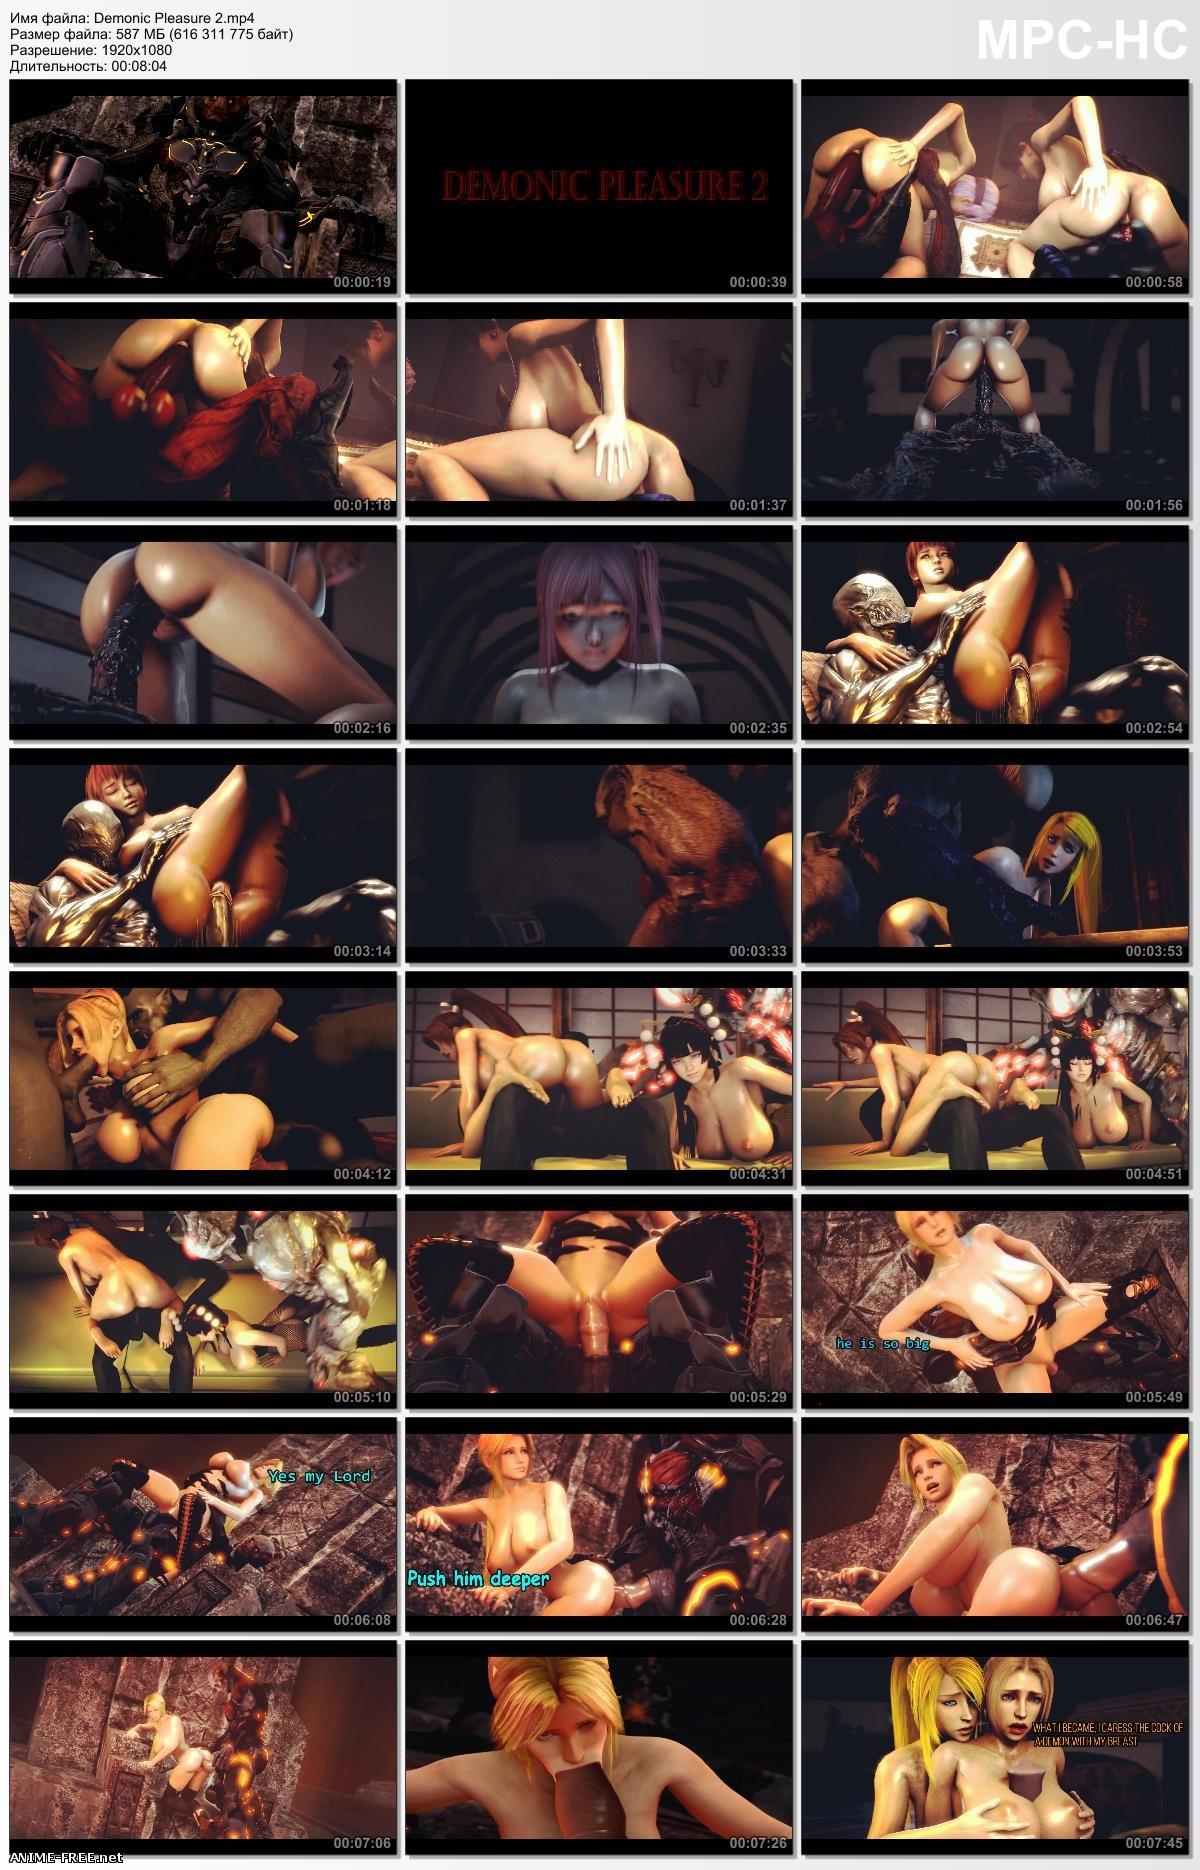 Demonic Pleasure / Демонское Удовольствие [2018] [Uncen] [Ep.1-2] [HD-1080p] [ENG] 3D-Hentai